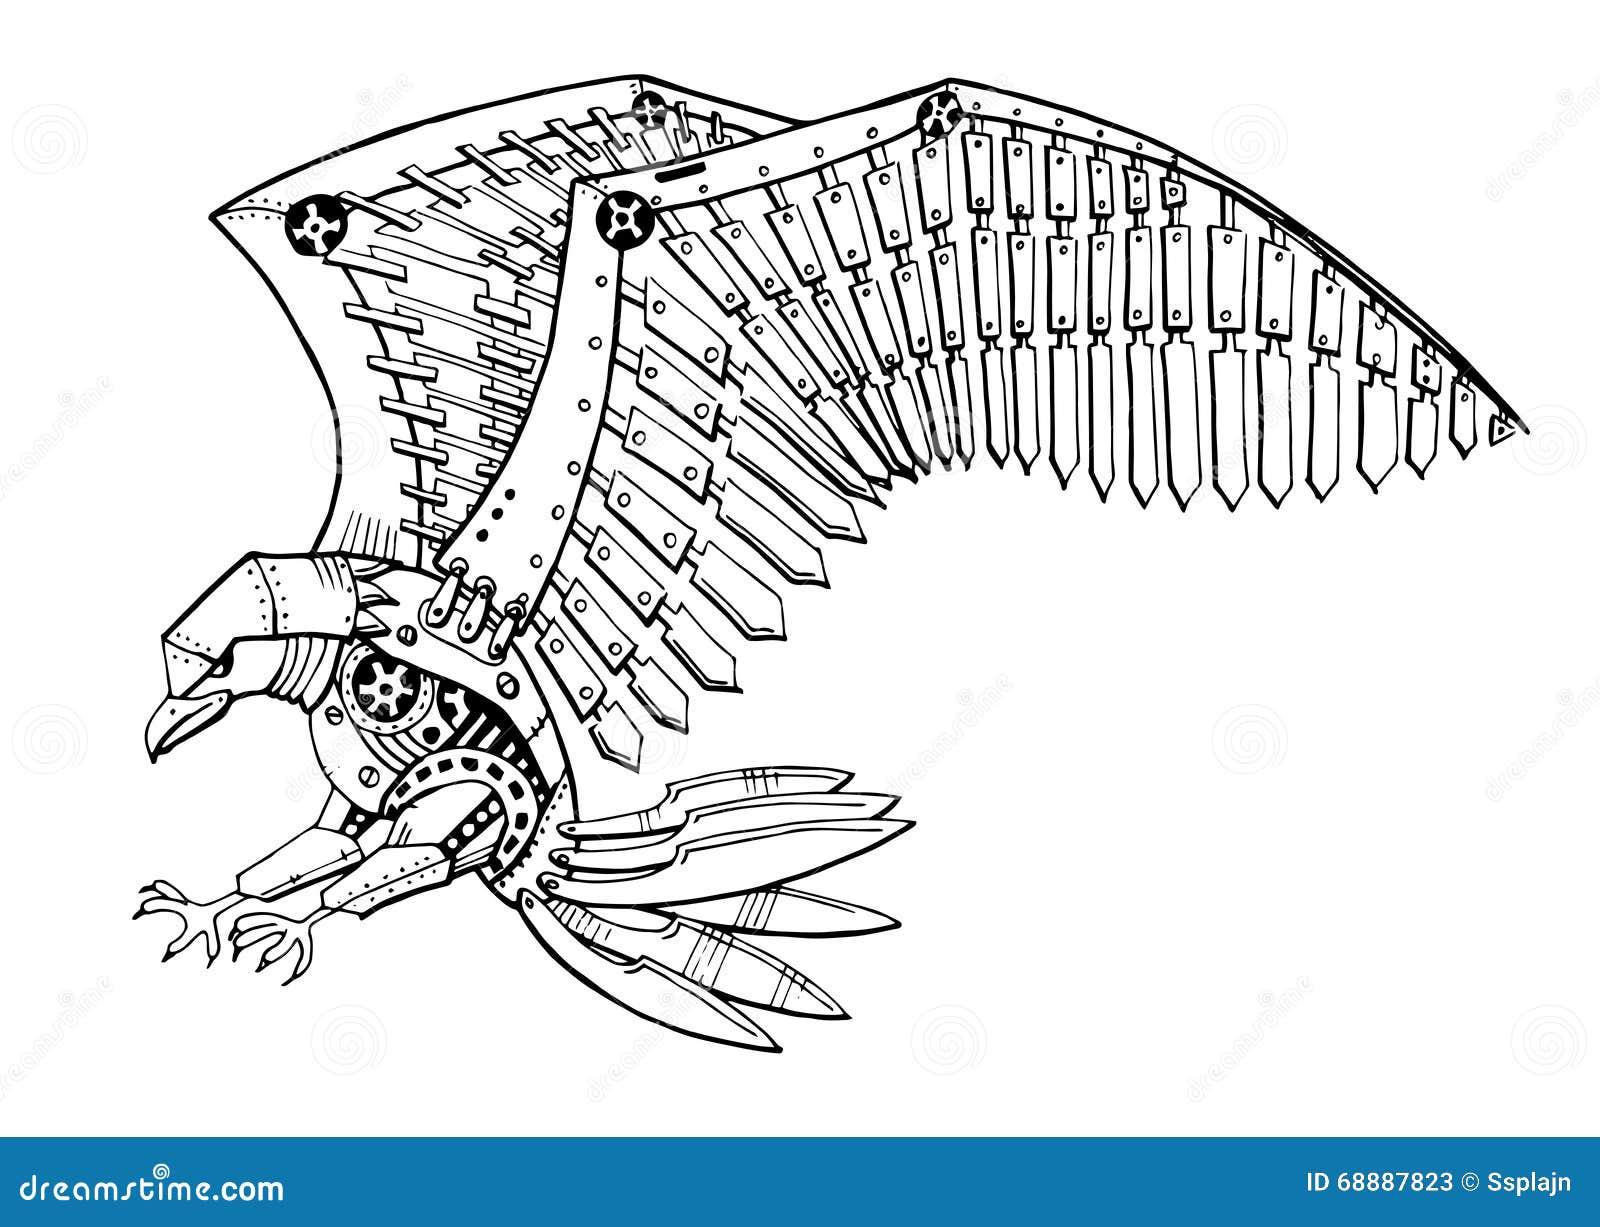 Eagle tattoo line drawing